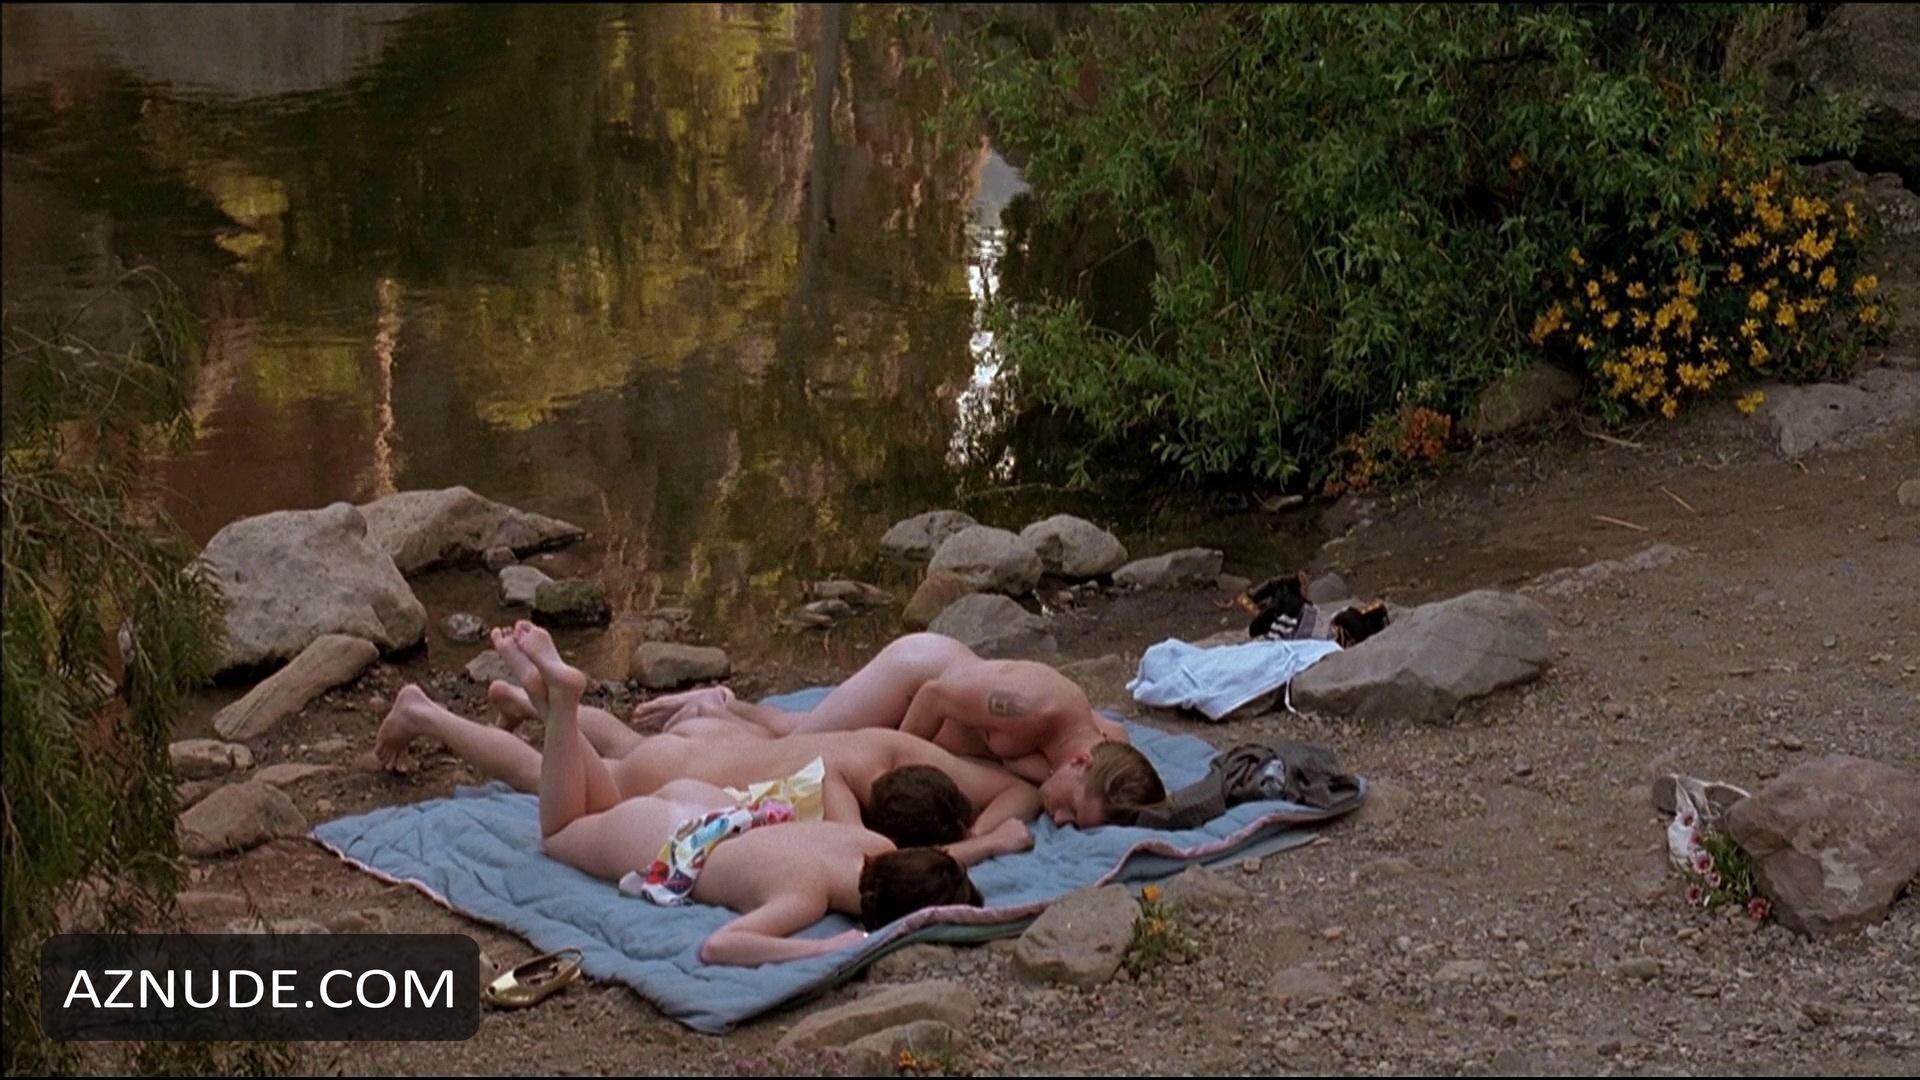 Threesome movie josh charles photo galleries